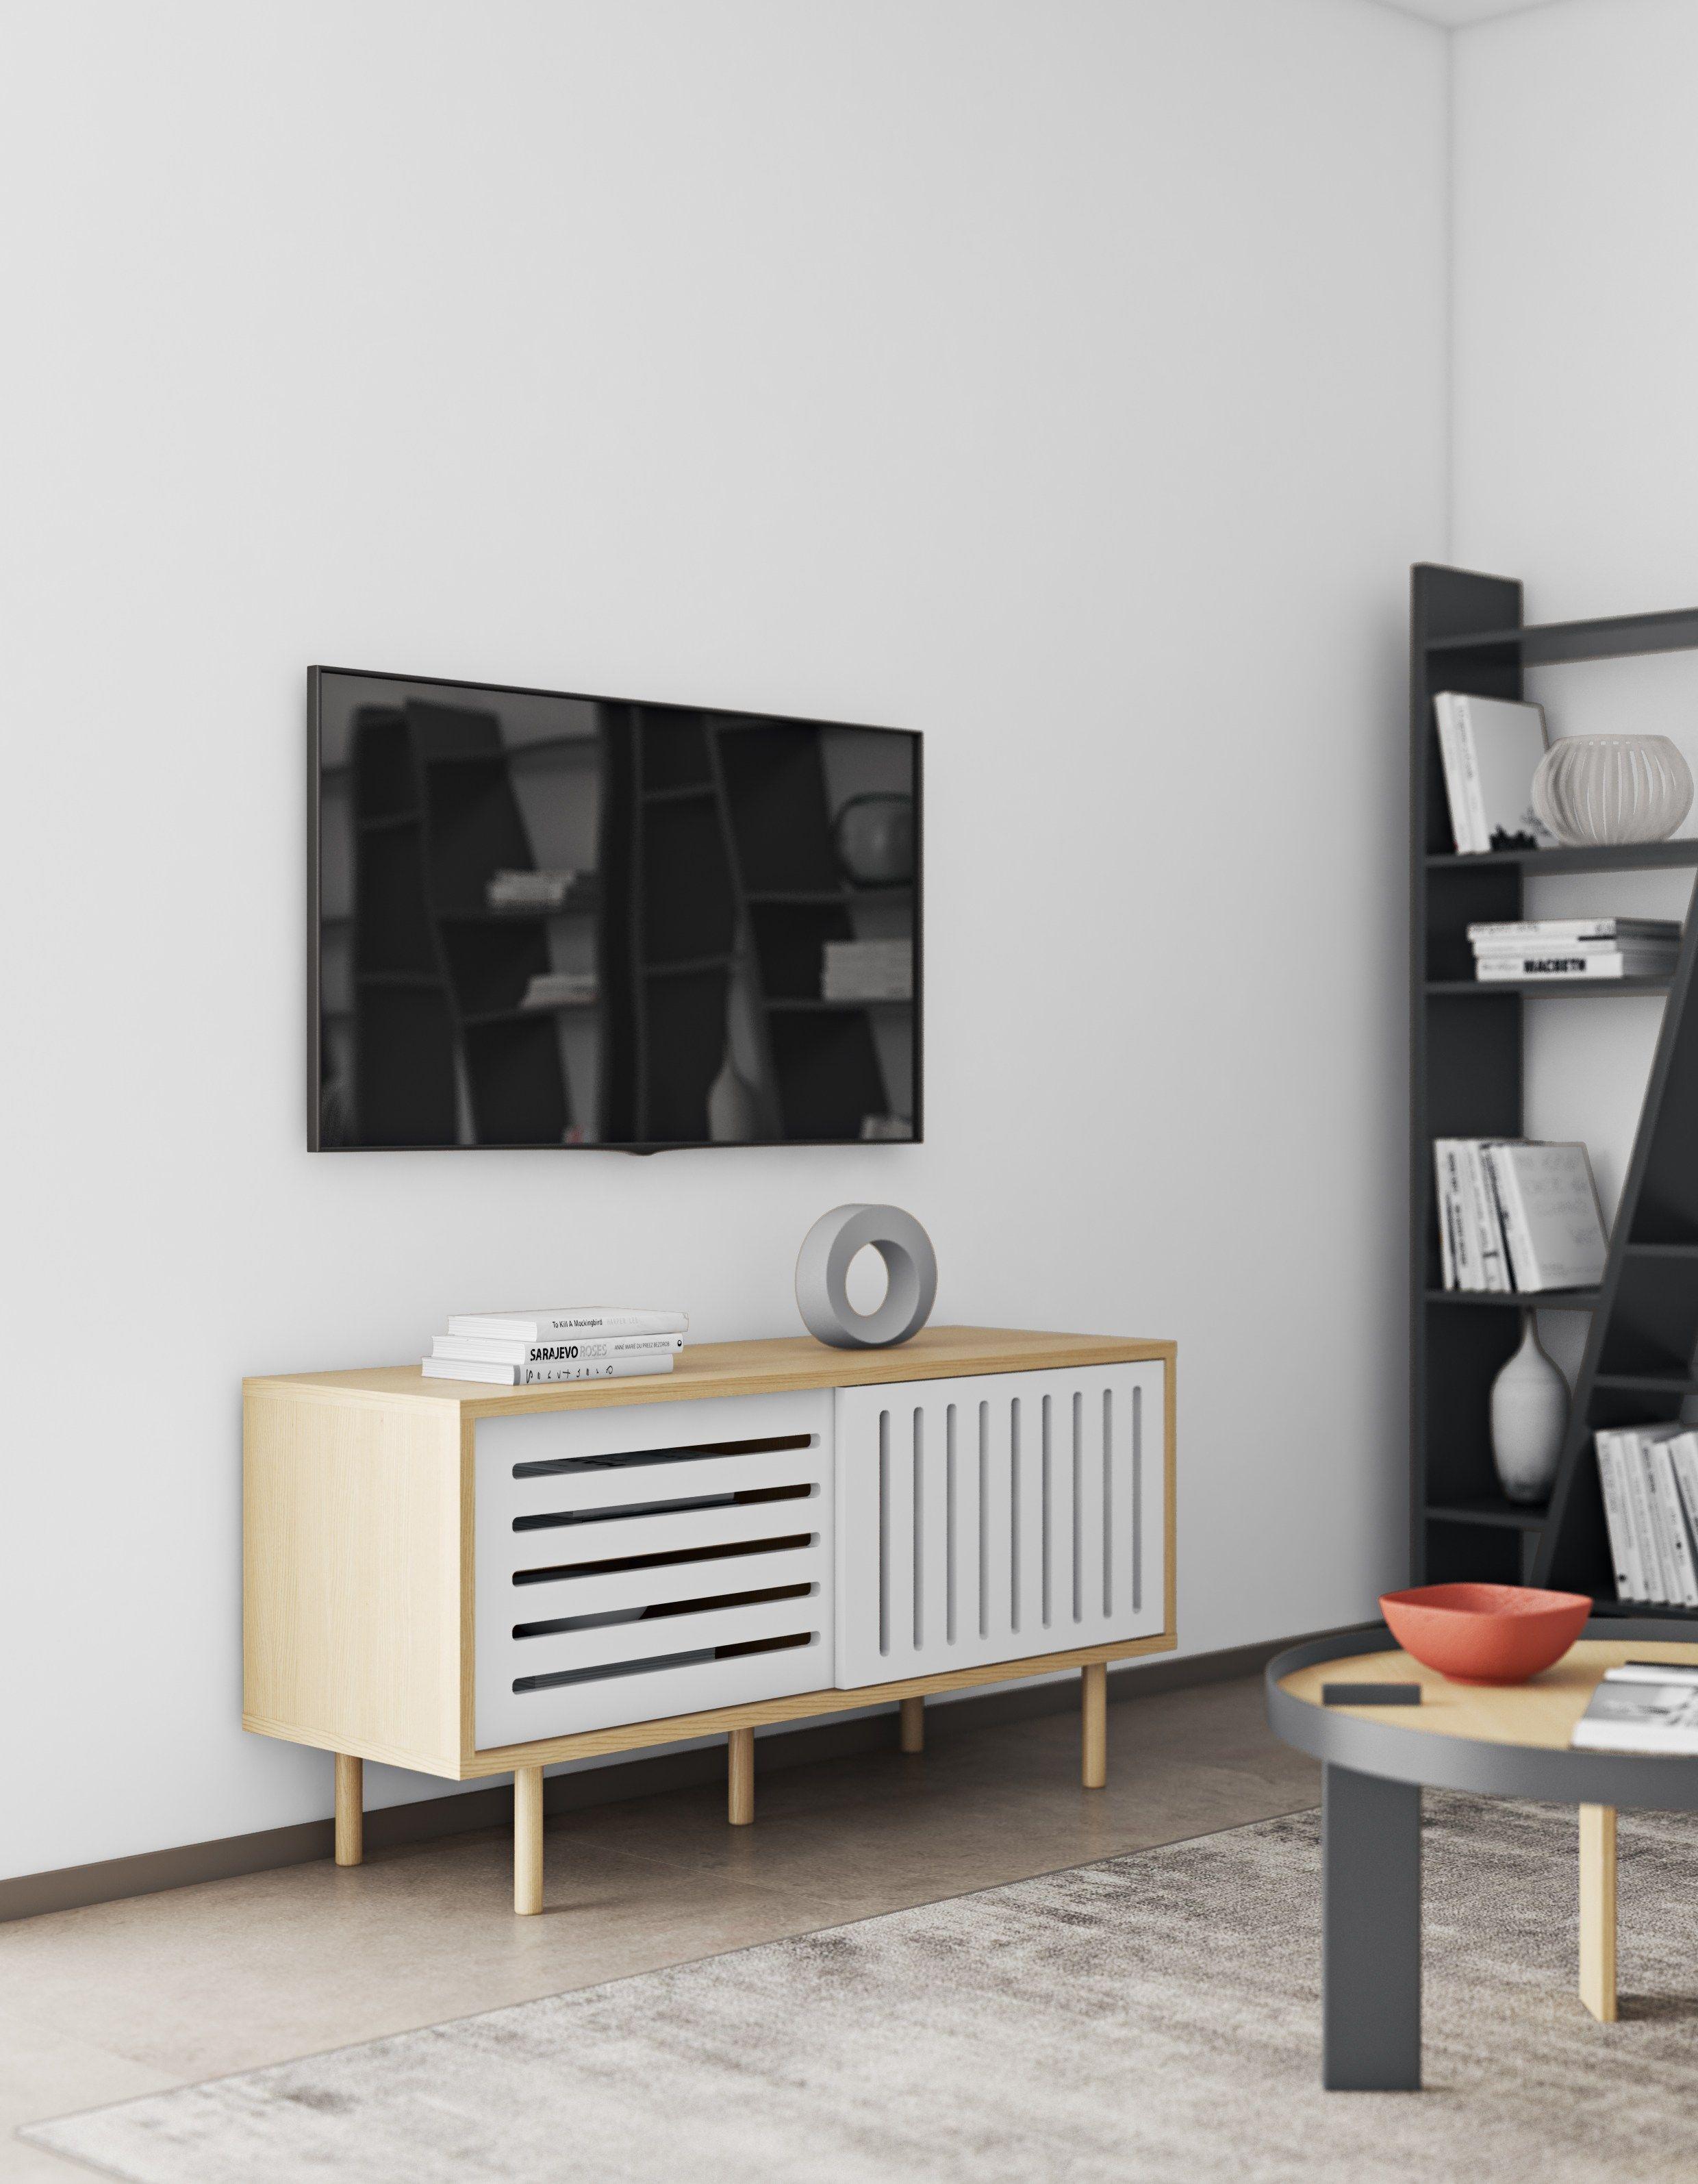 dann stripes  tv cabinet dann collection by temahome design  - dann stripes  tv cabinet dann collection by temahome design rodolphecastellani